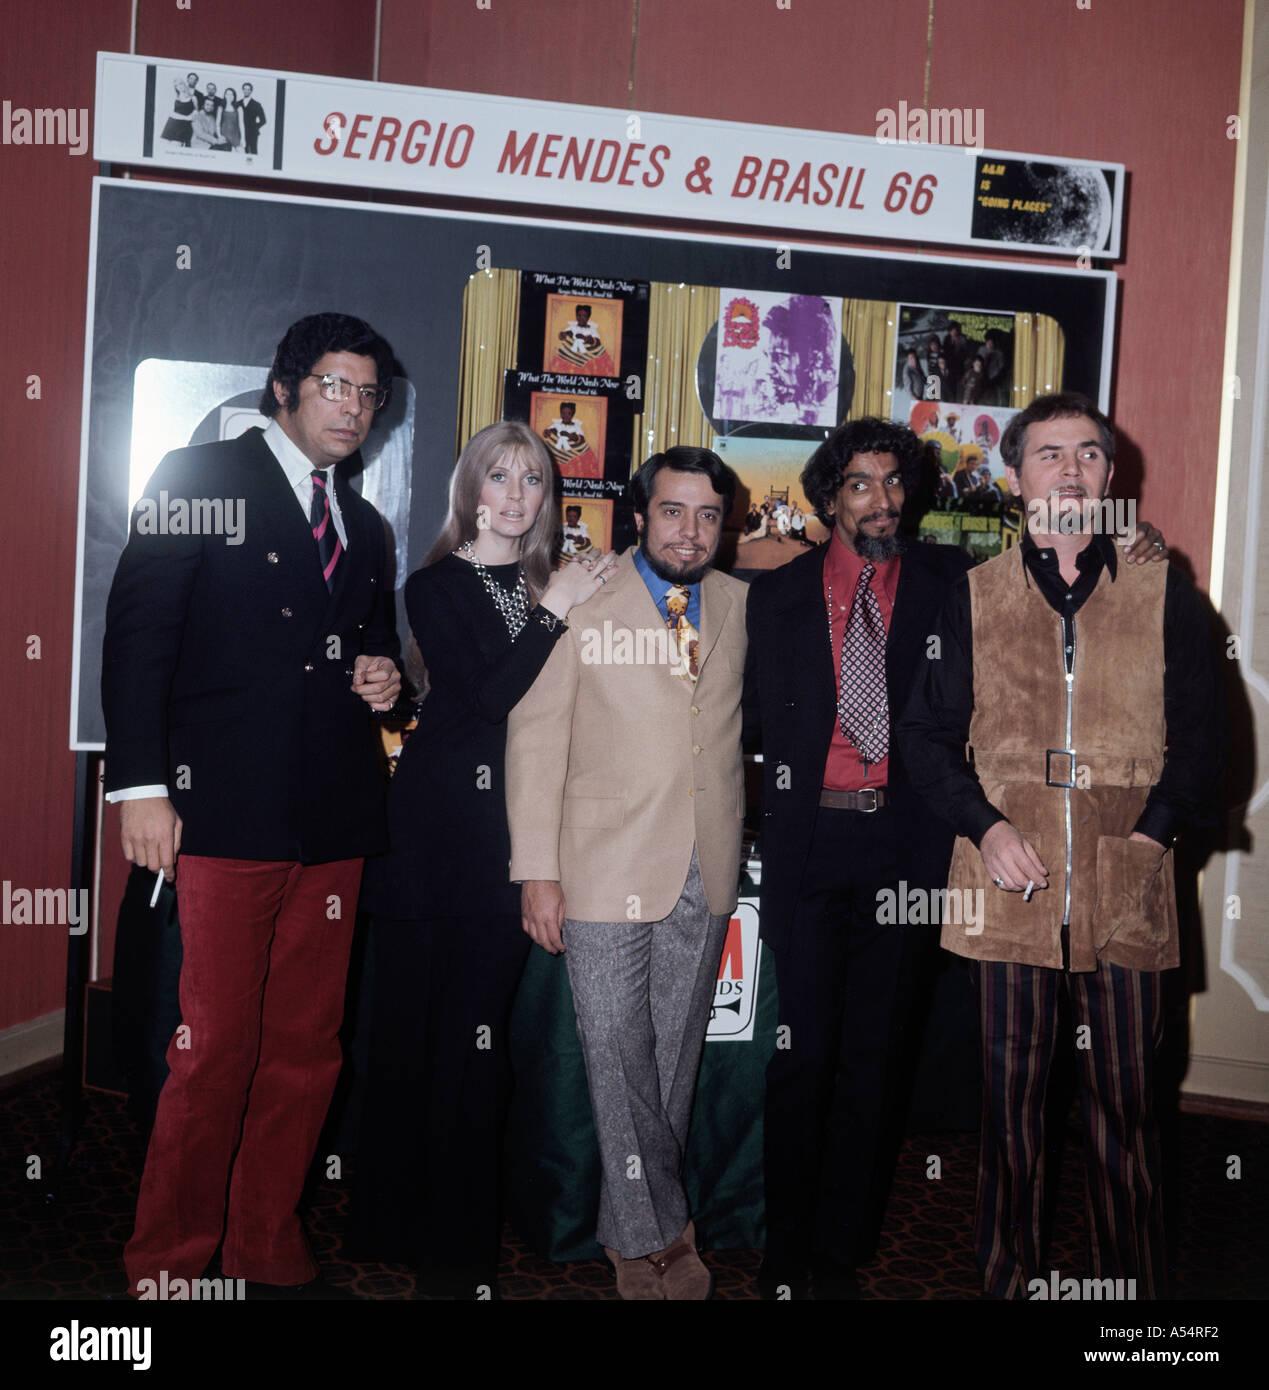 SERGIO MENDES BRASIL 66 lateinamerikanischen Gruppe über 1967 Stockbild